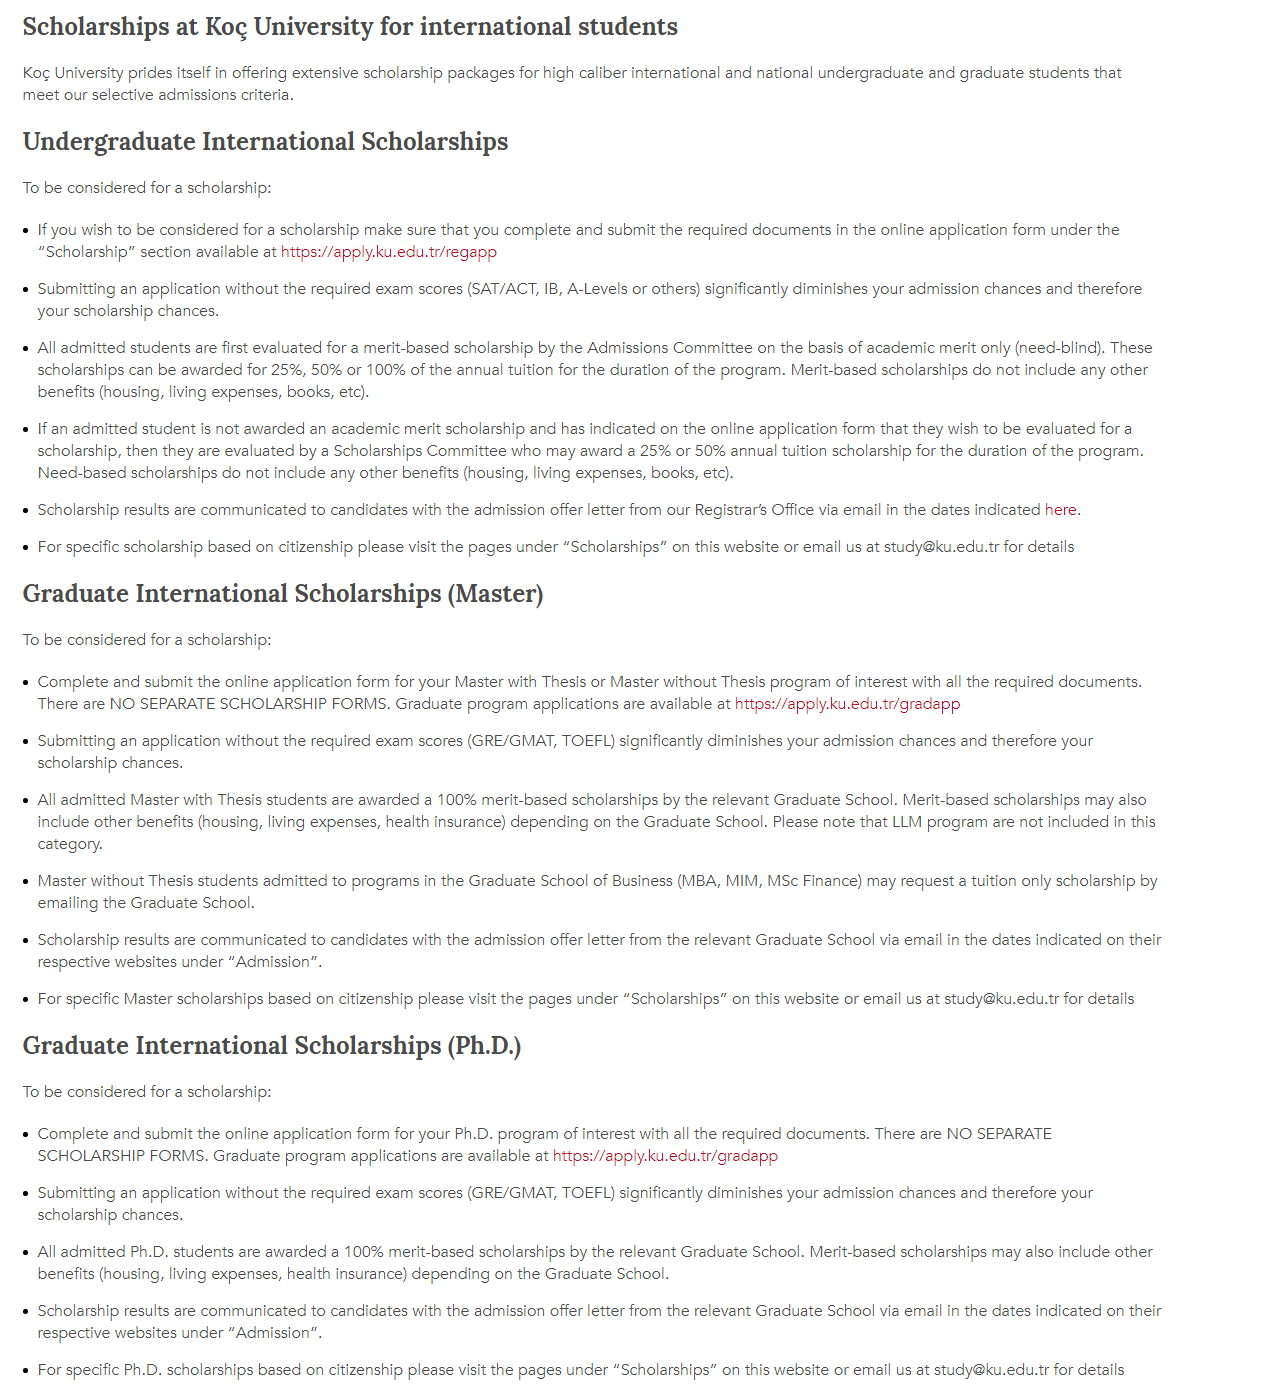 Scholarships at Koc University for international students in